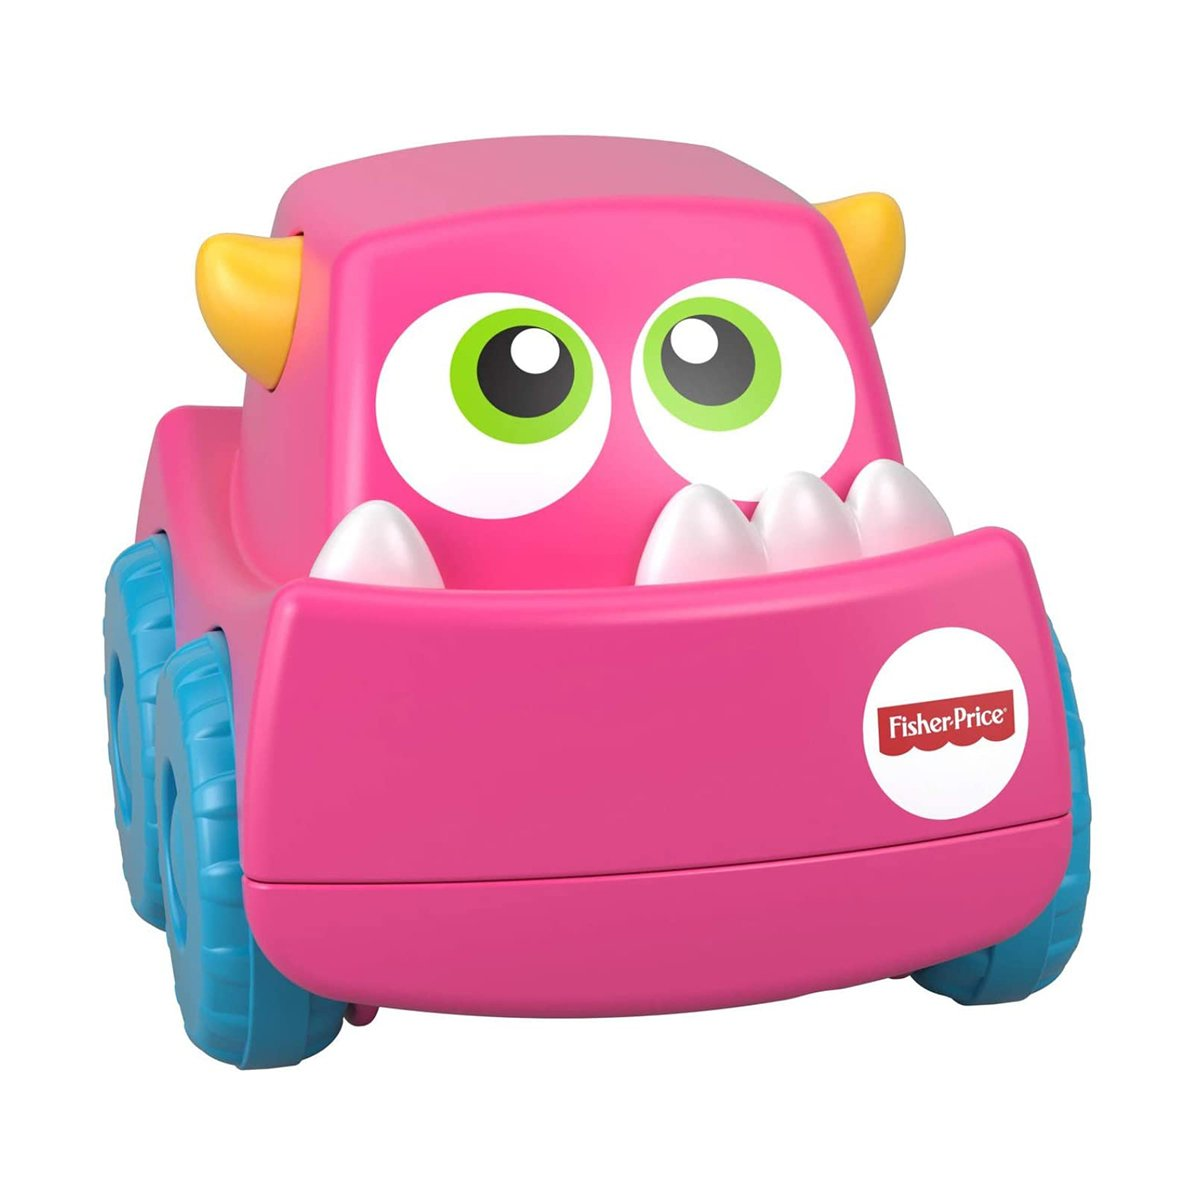 Jucarie bebelusi Mini vehicul monstrulet Fisher Price, Roz imagine